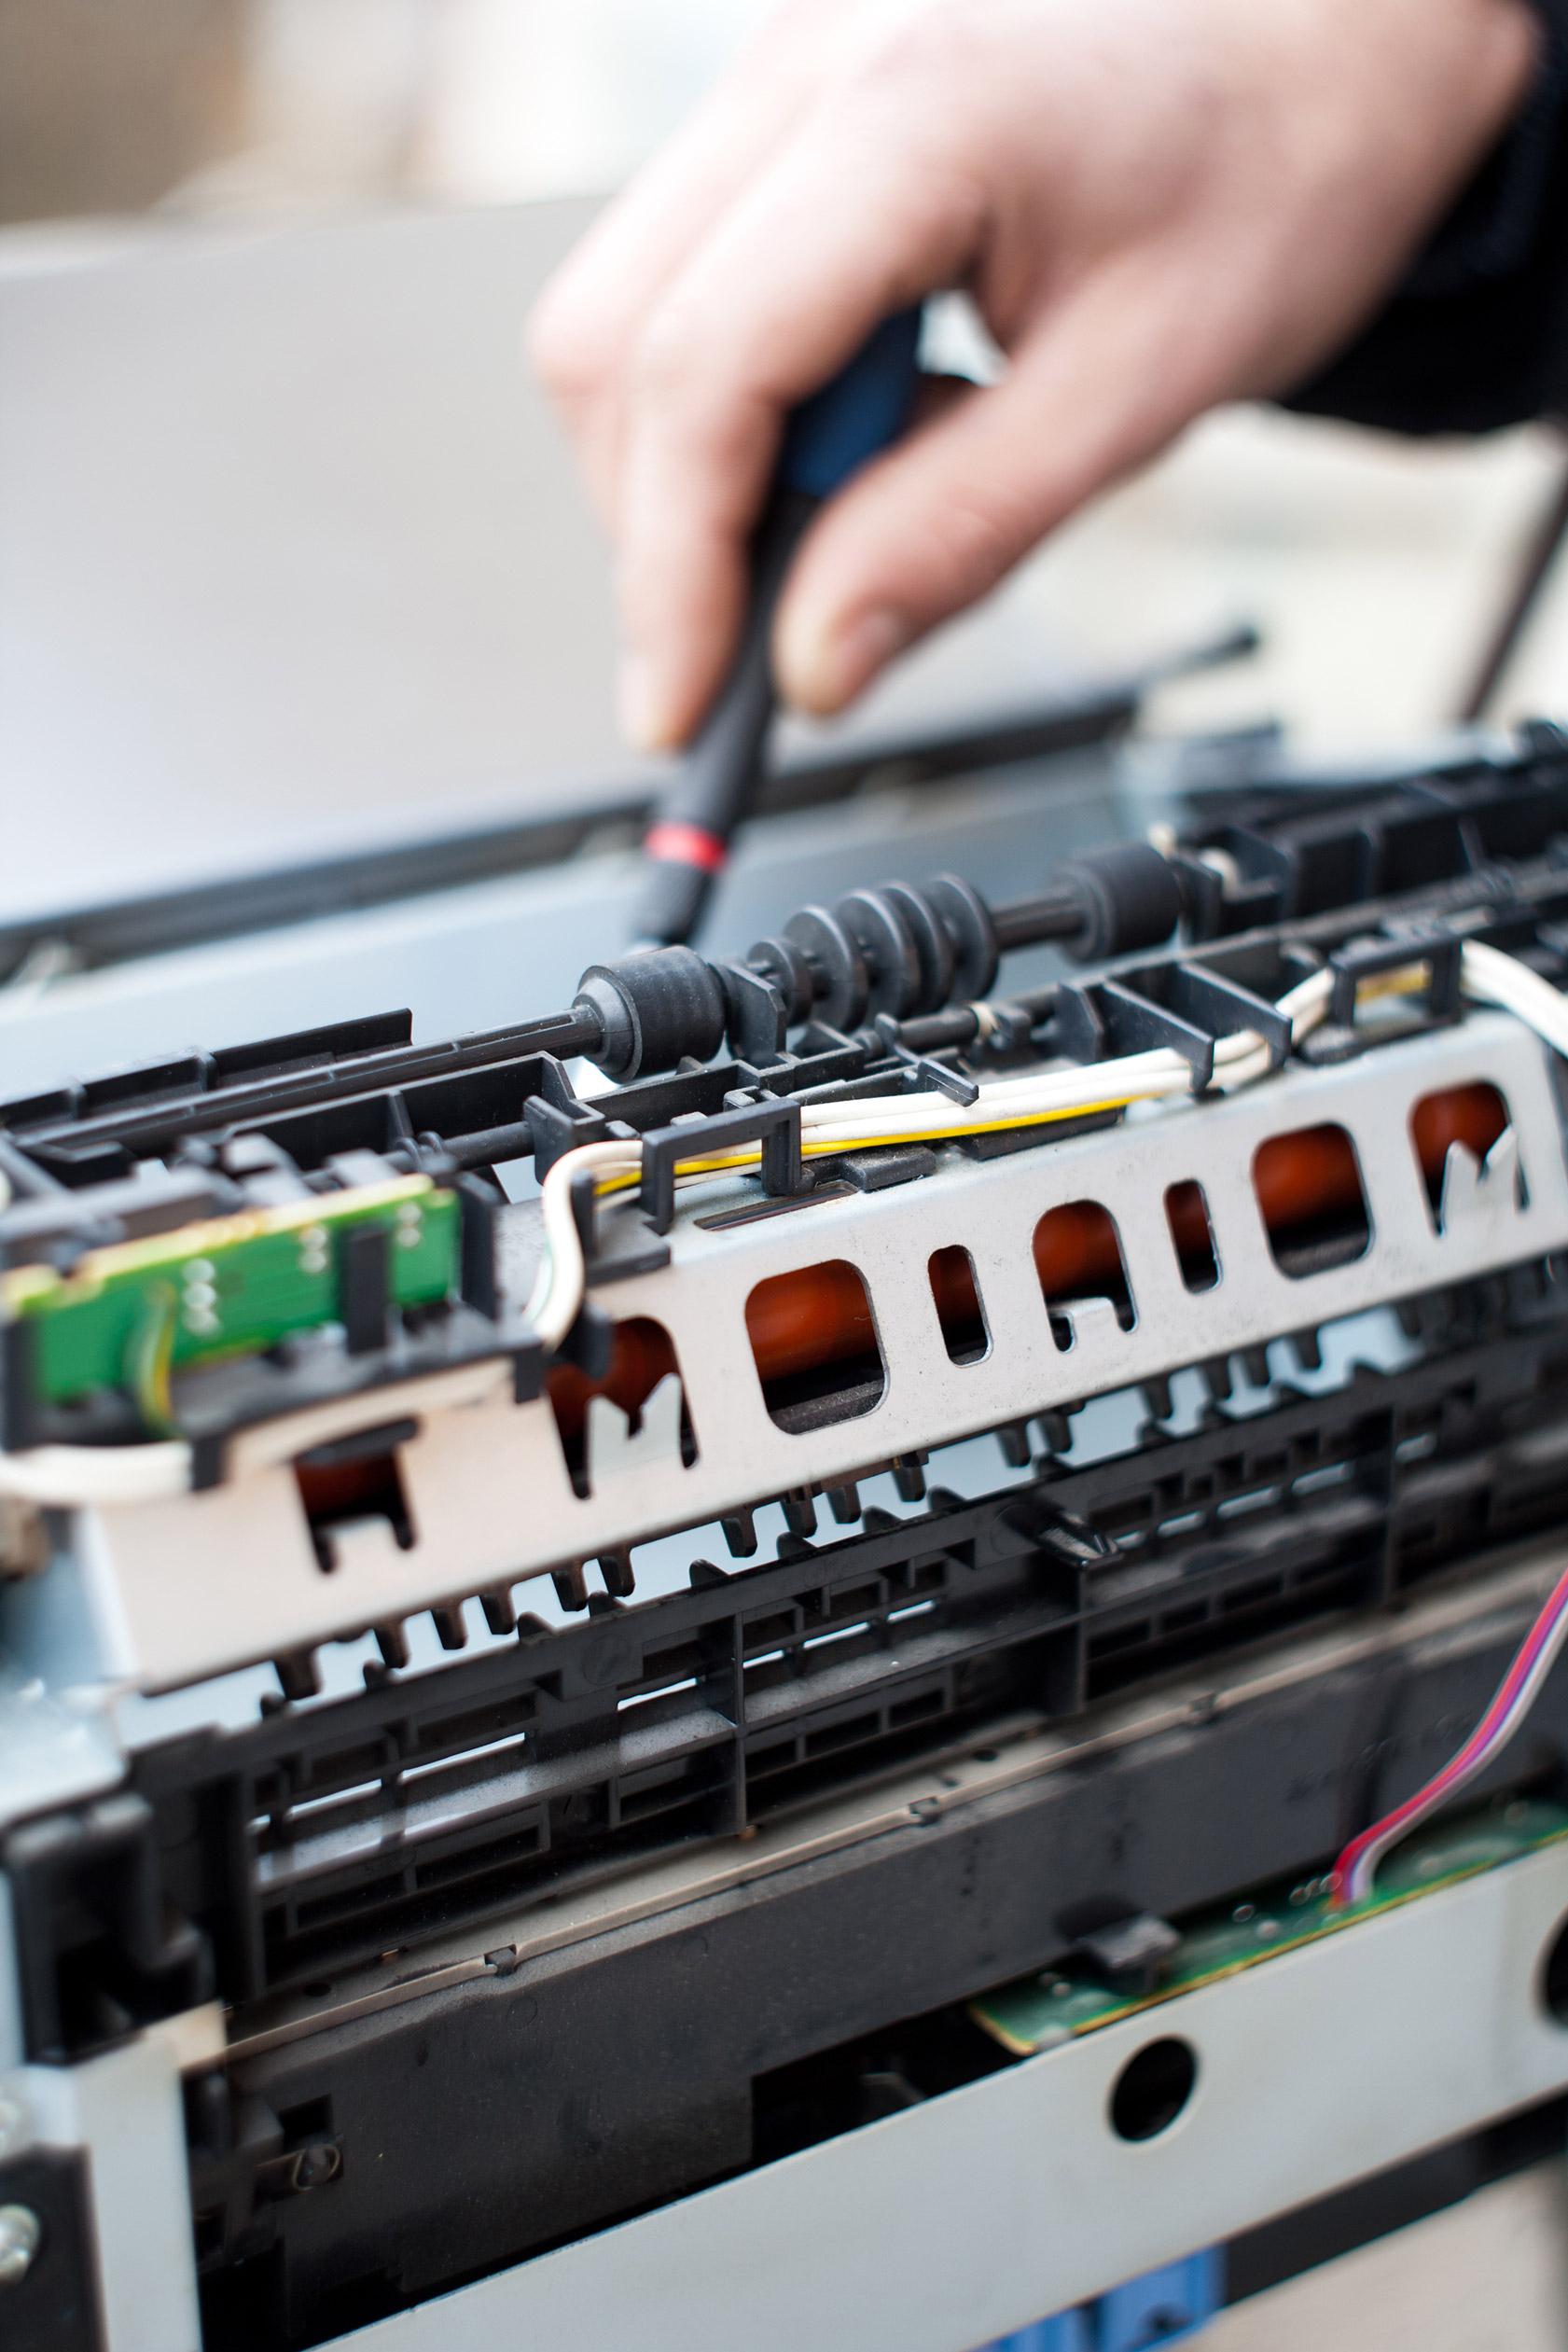 Drucker Wartung beugt Drucker Reparatur vor